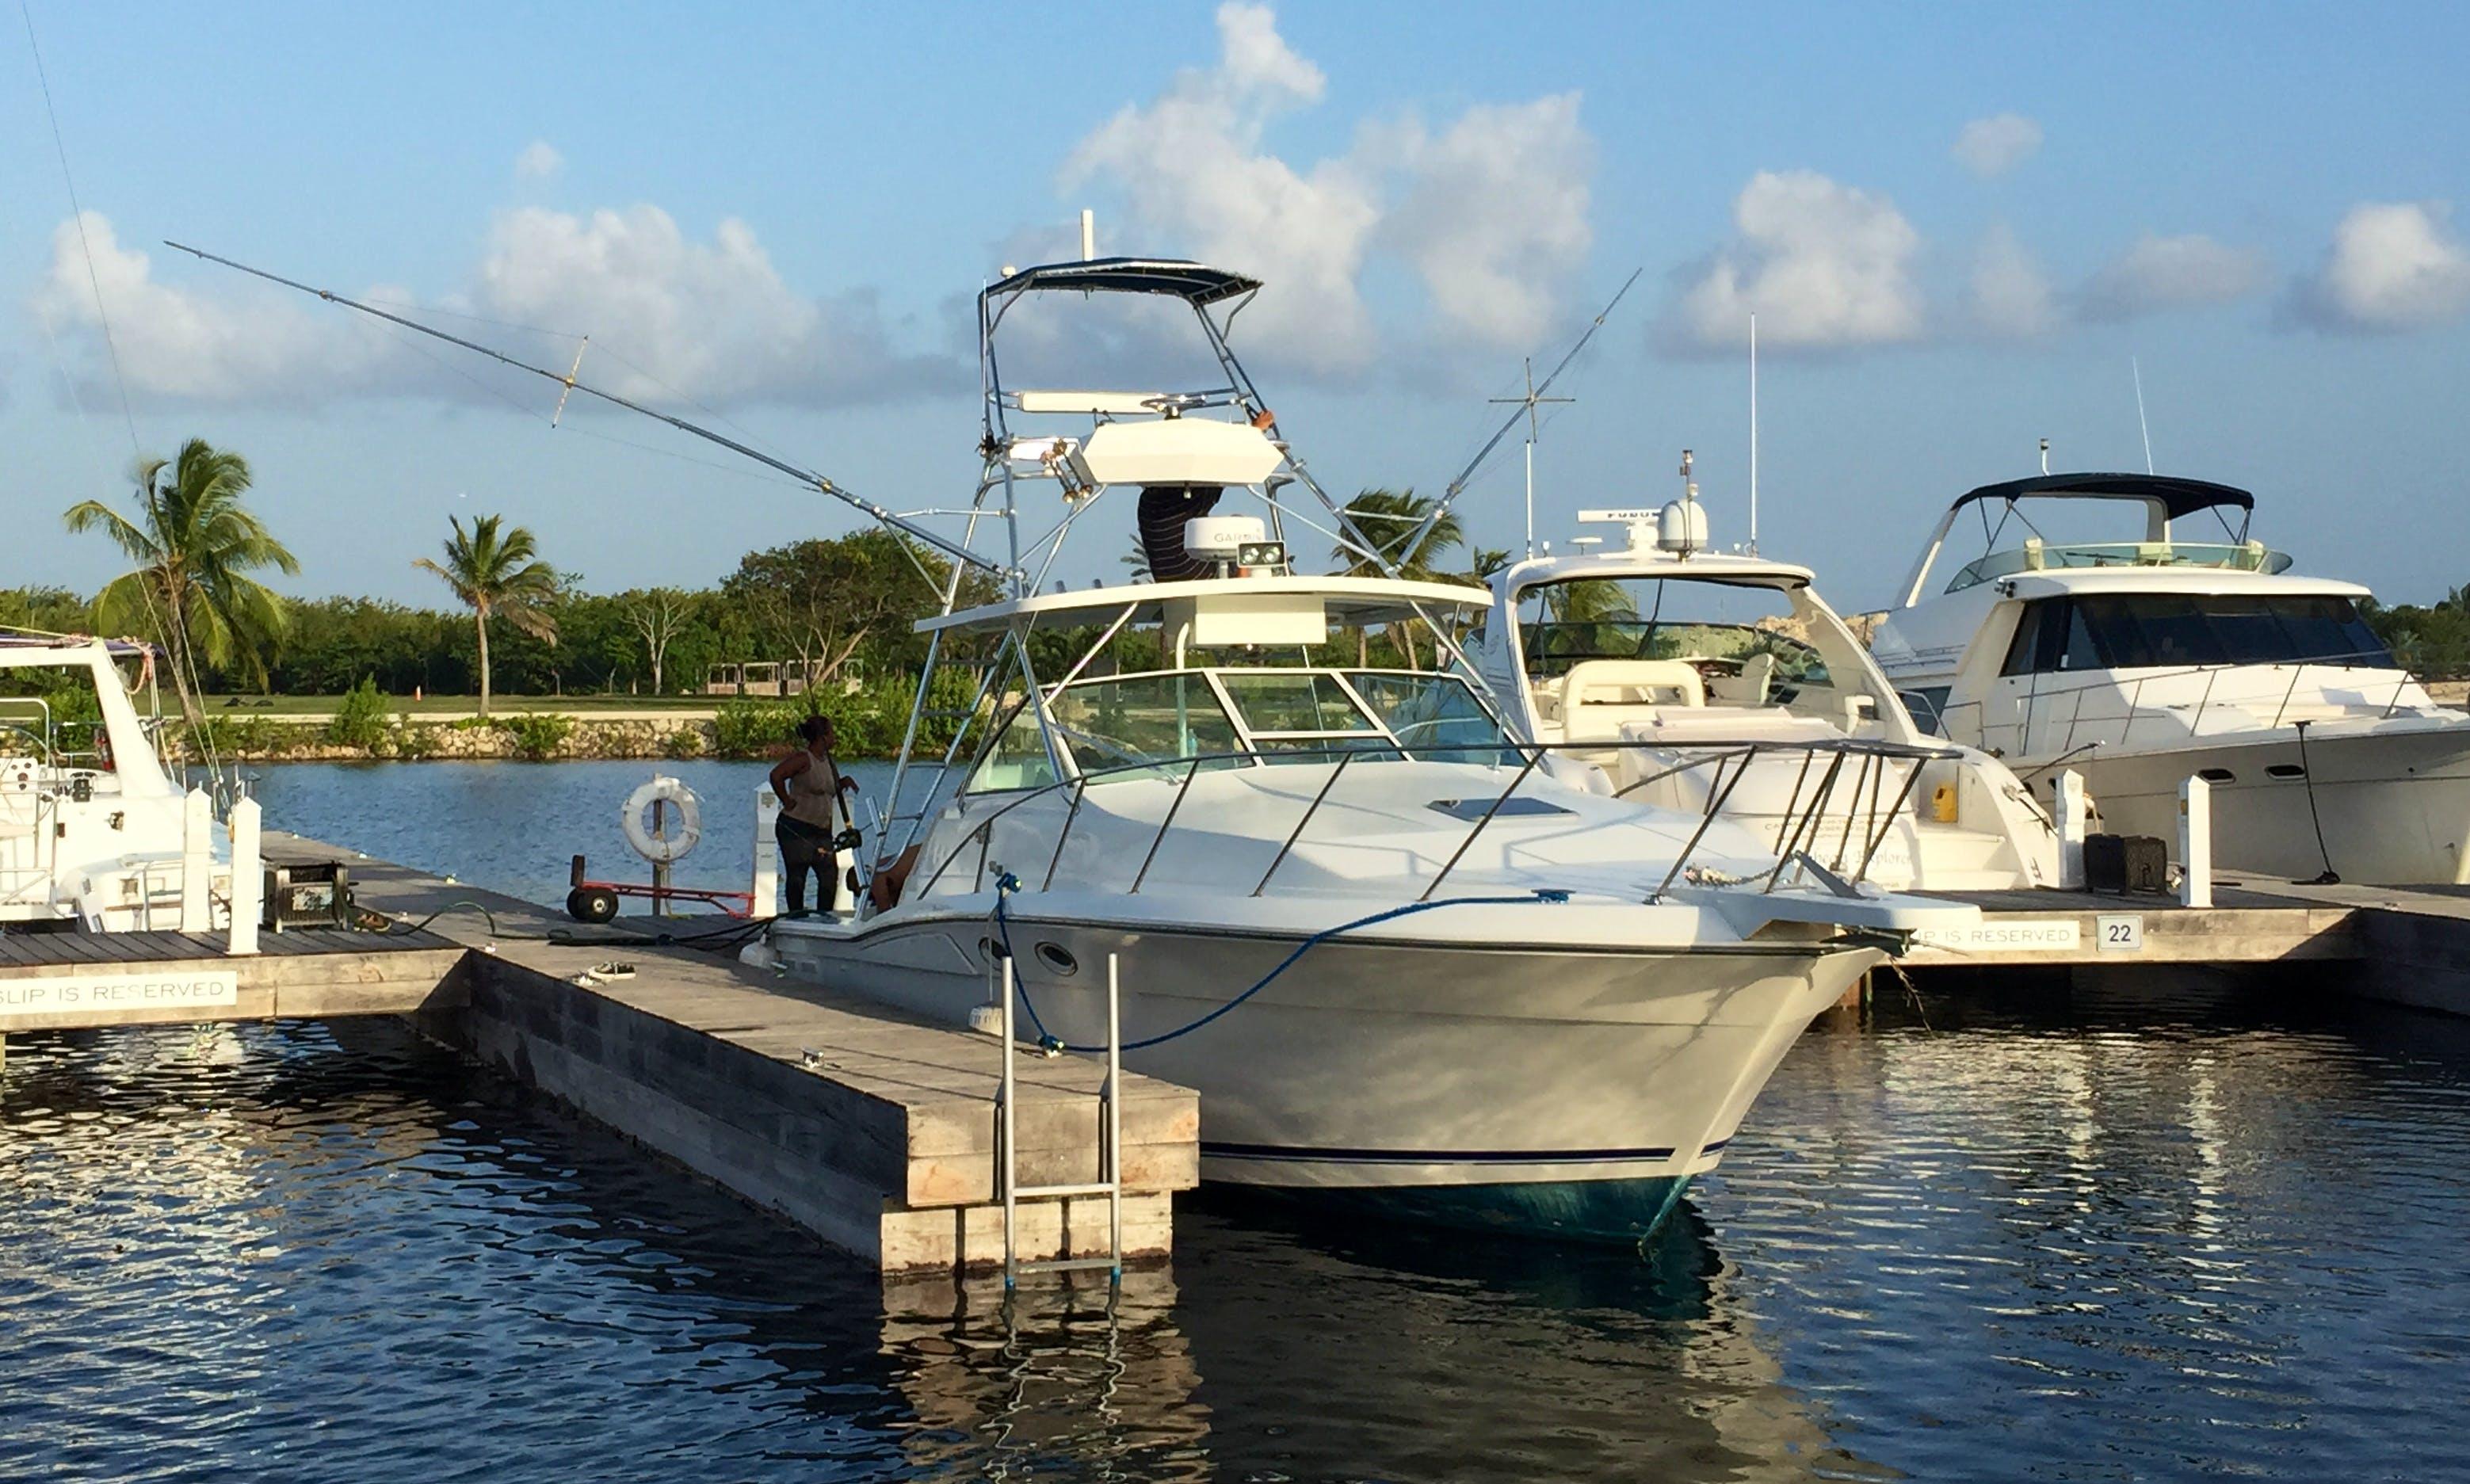 38' Wellcraft Boat Charter in Cayman Islands